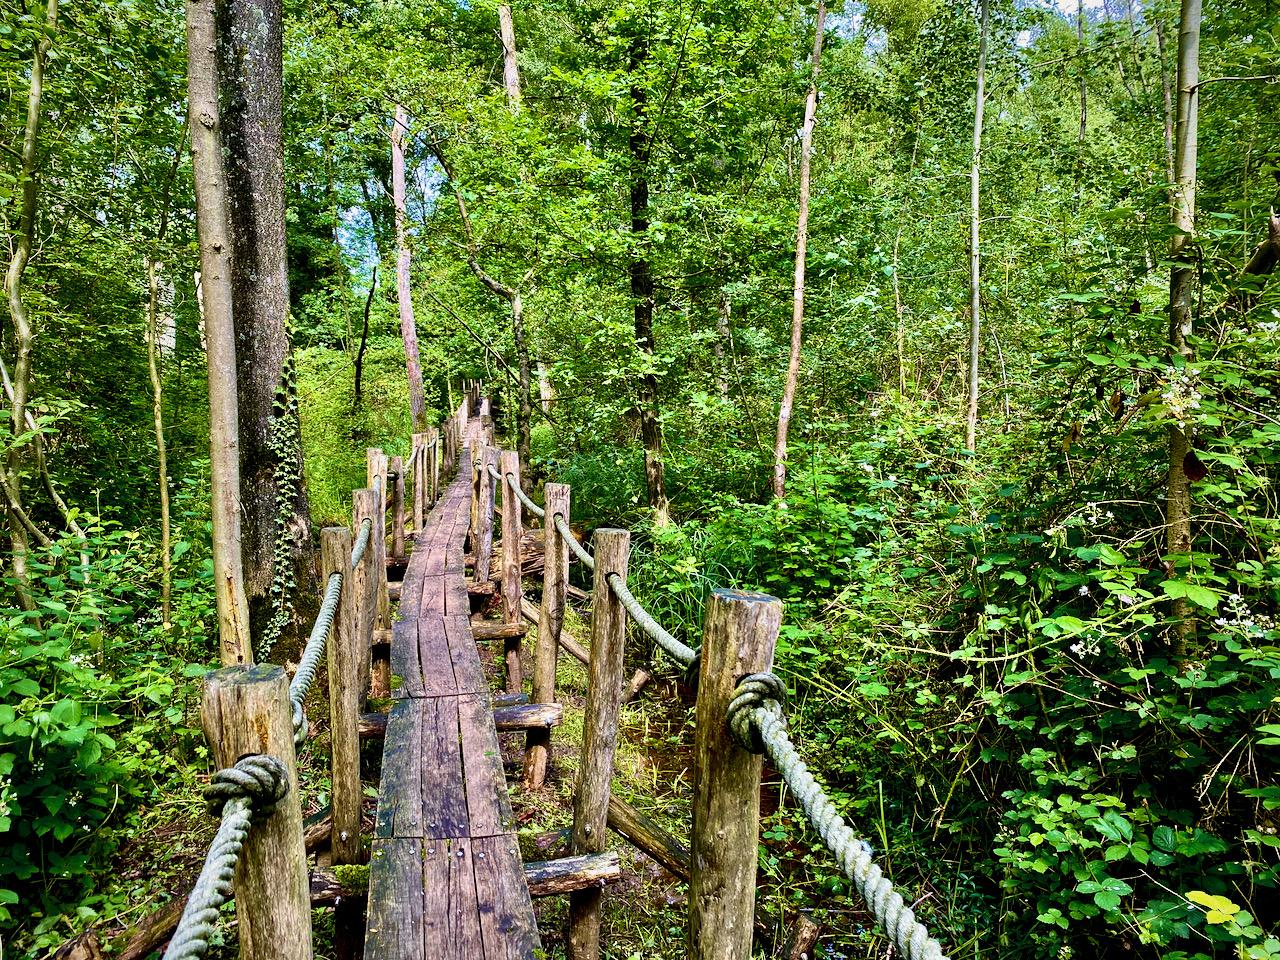 Knuppelpad in de Vallei van de Serskampse beek op de 4 bossenwandeling